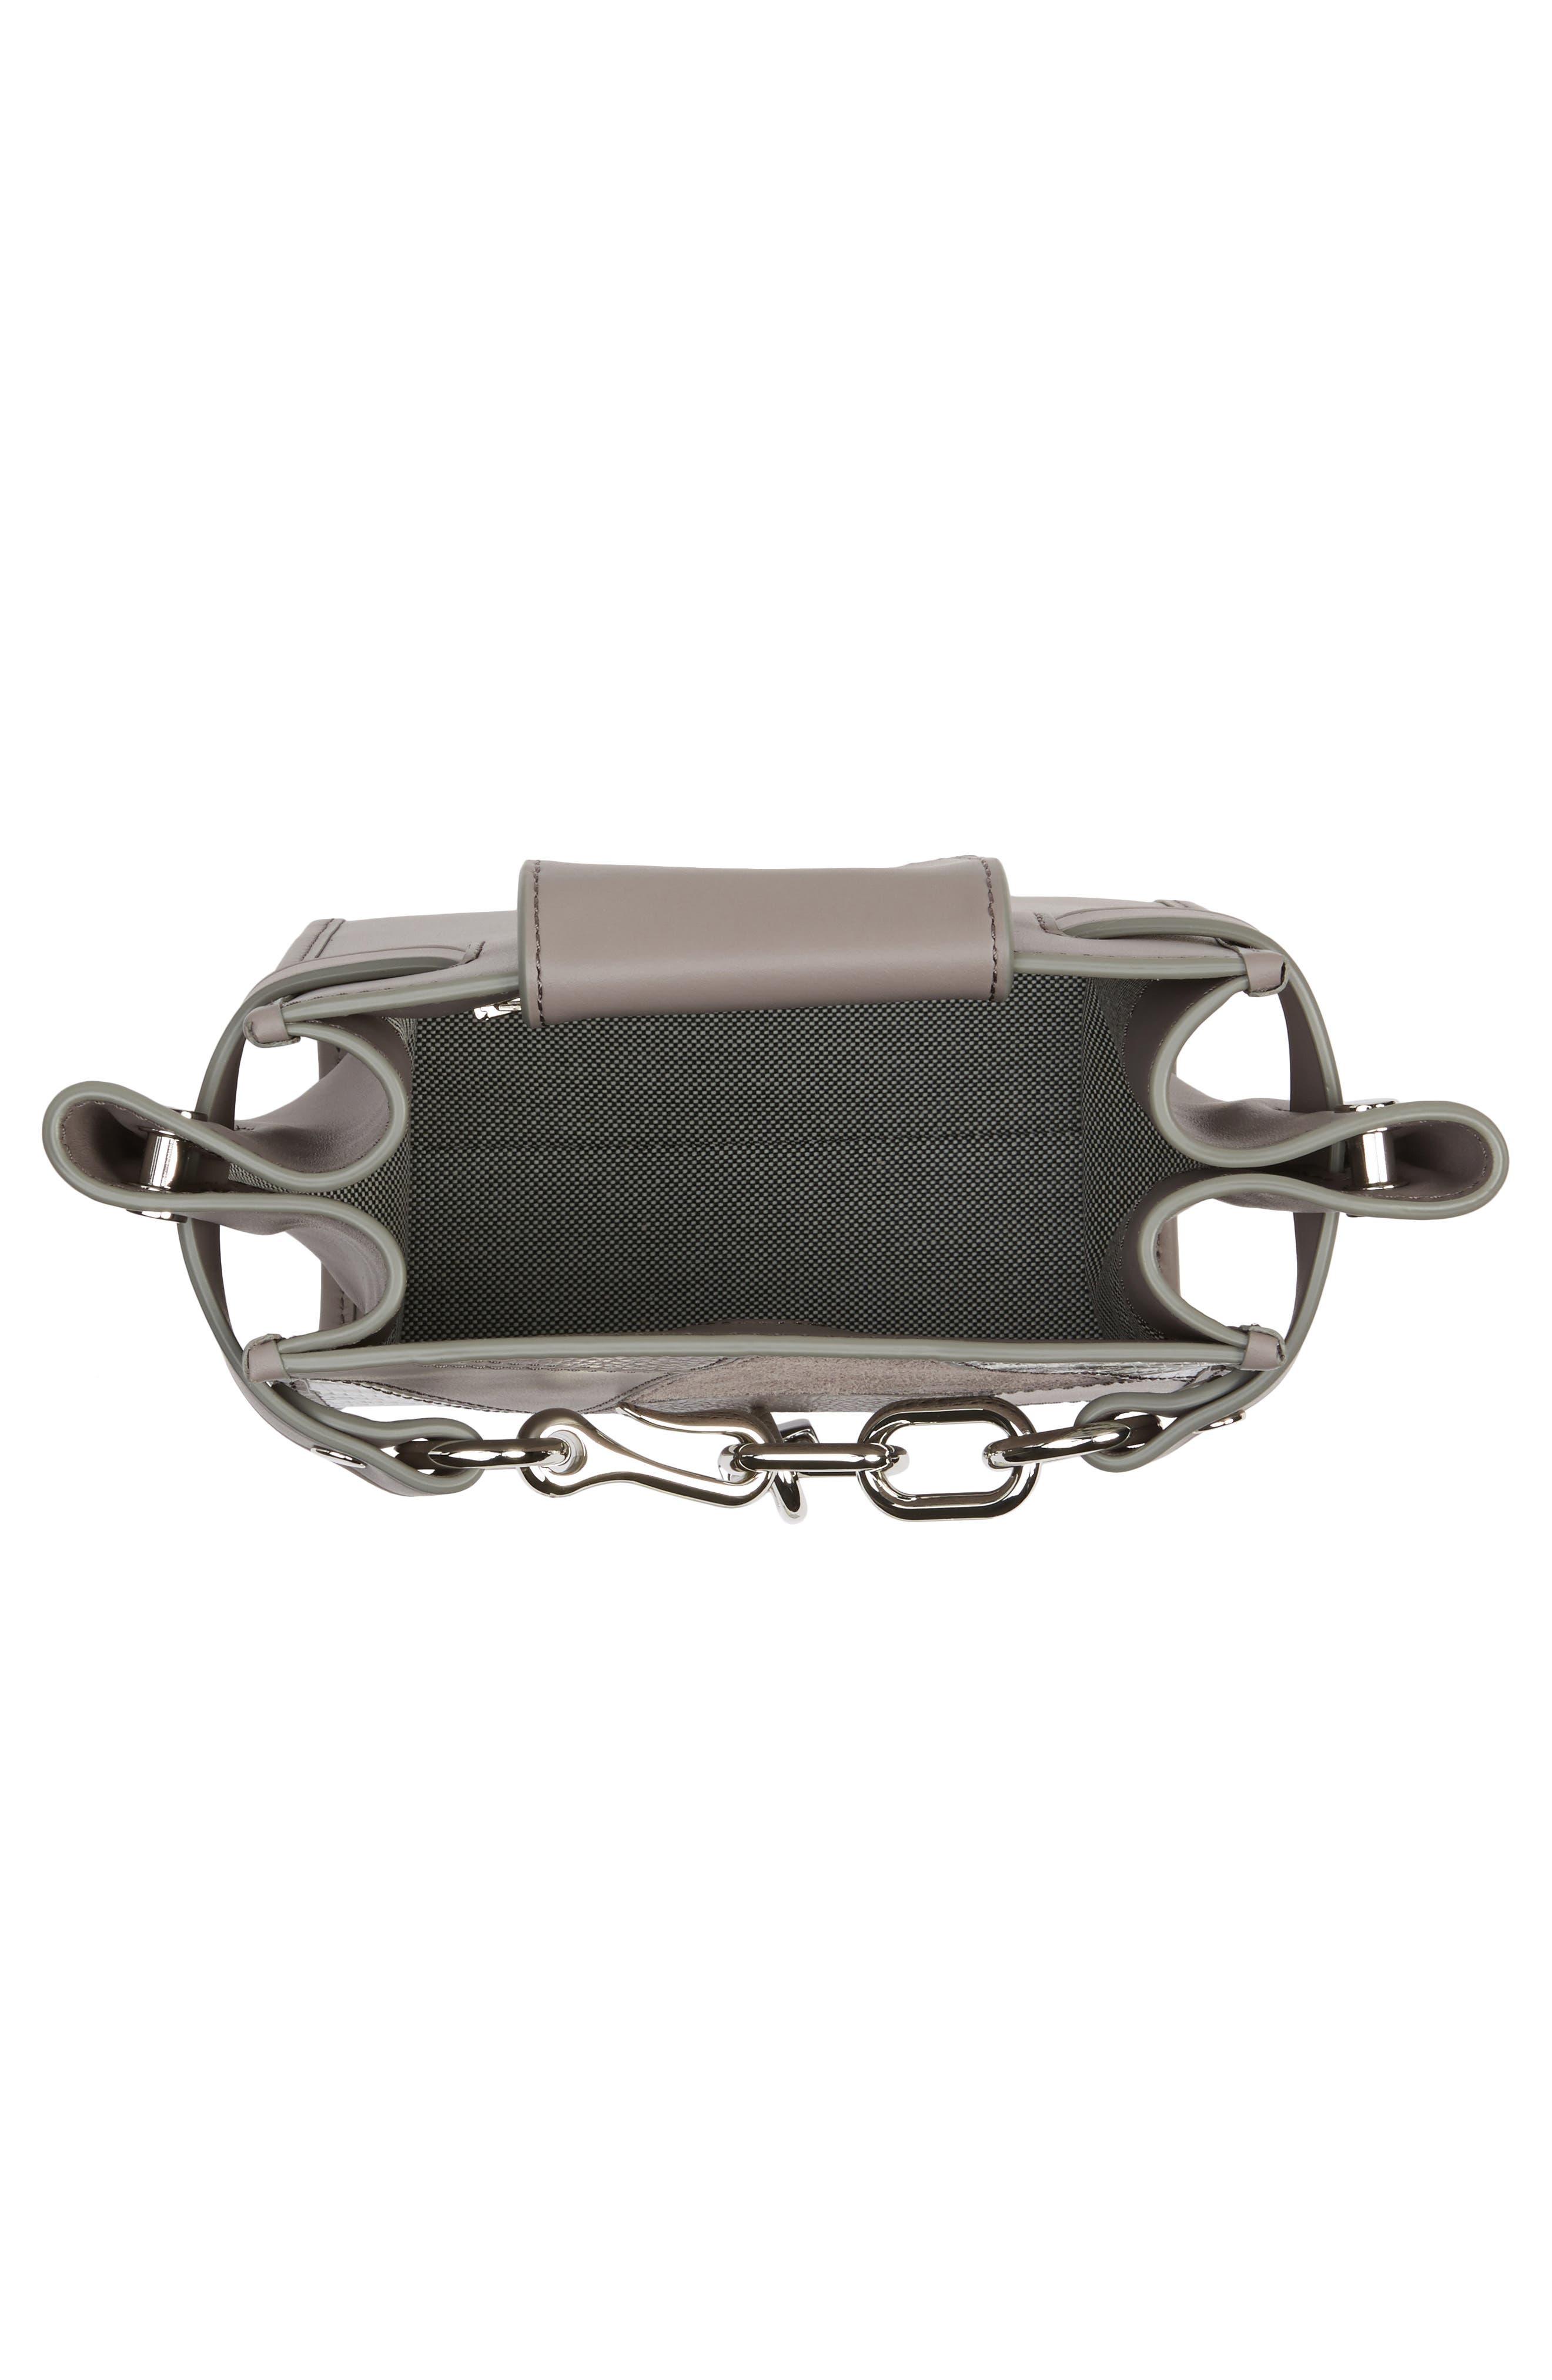 Mini Attica Patchwork Leather Satchel,                             Alternate thumbnail 4, color,                             Grey Multi